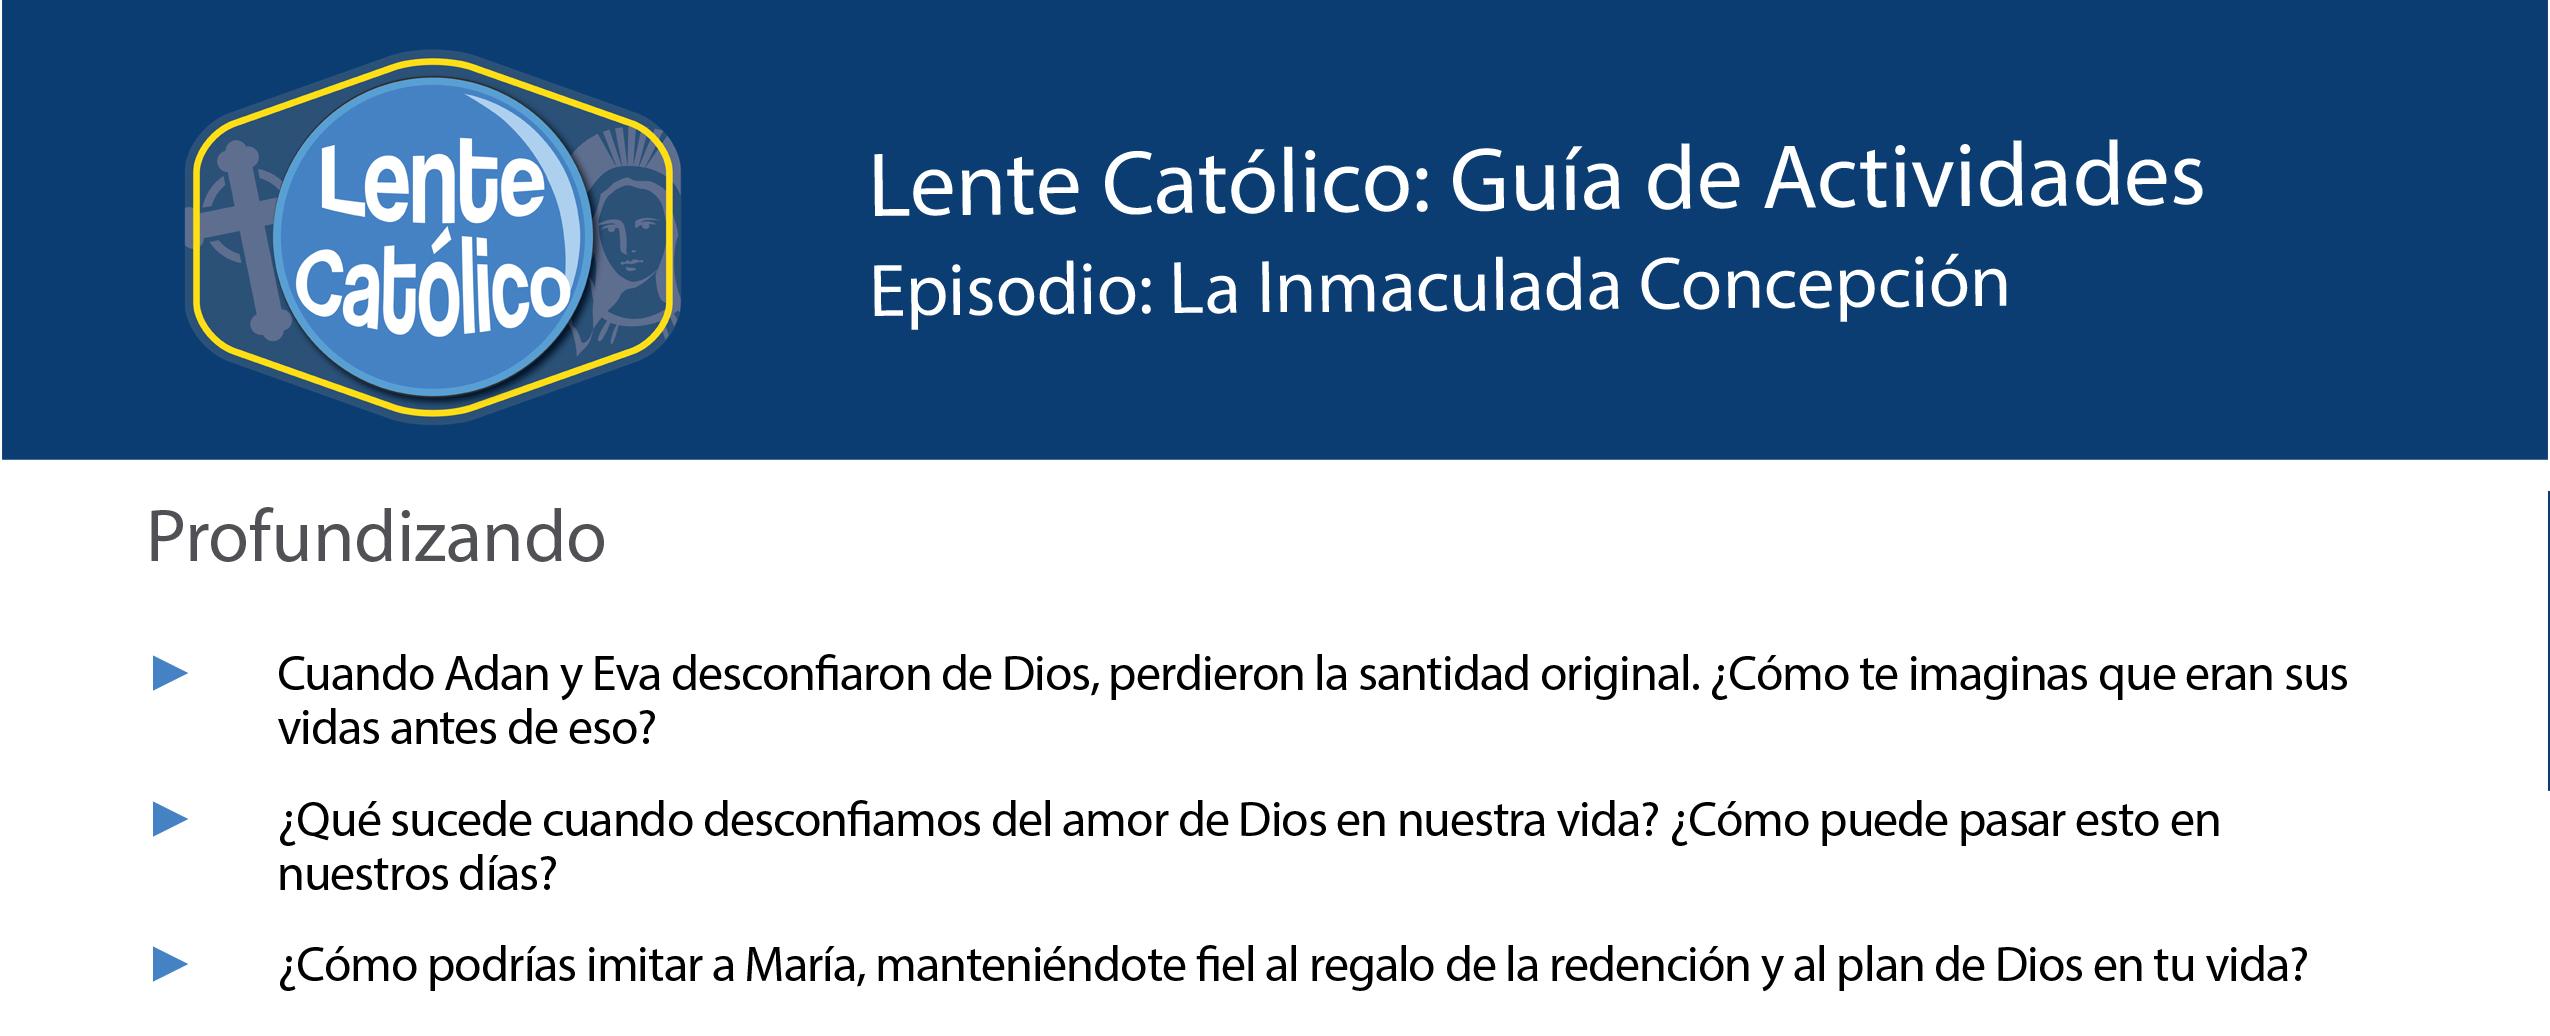 Inmaculada Concepcion Photo Guide